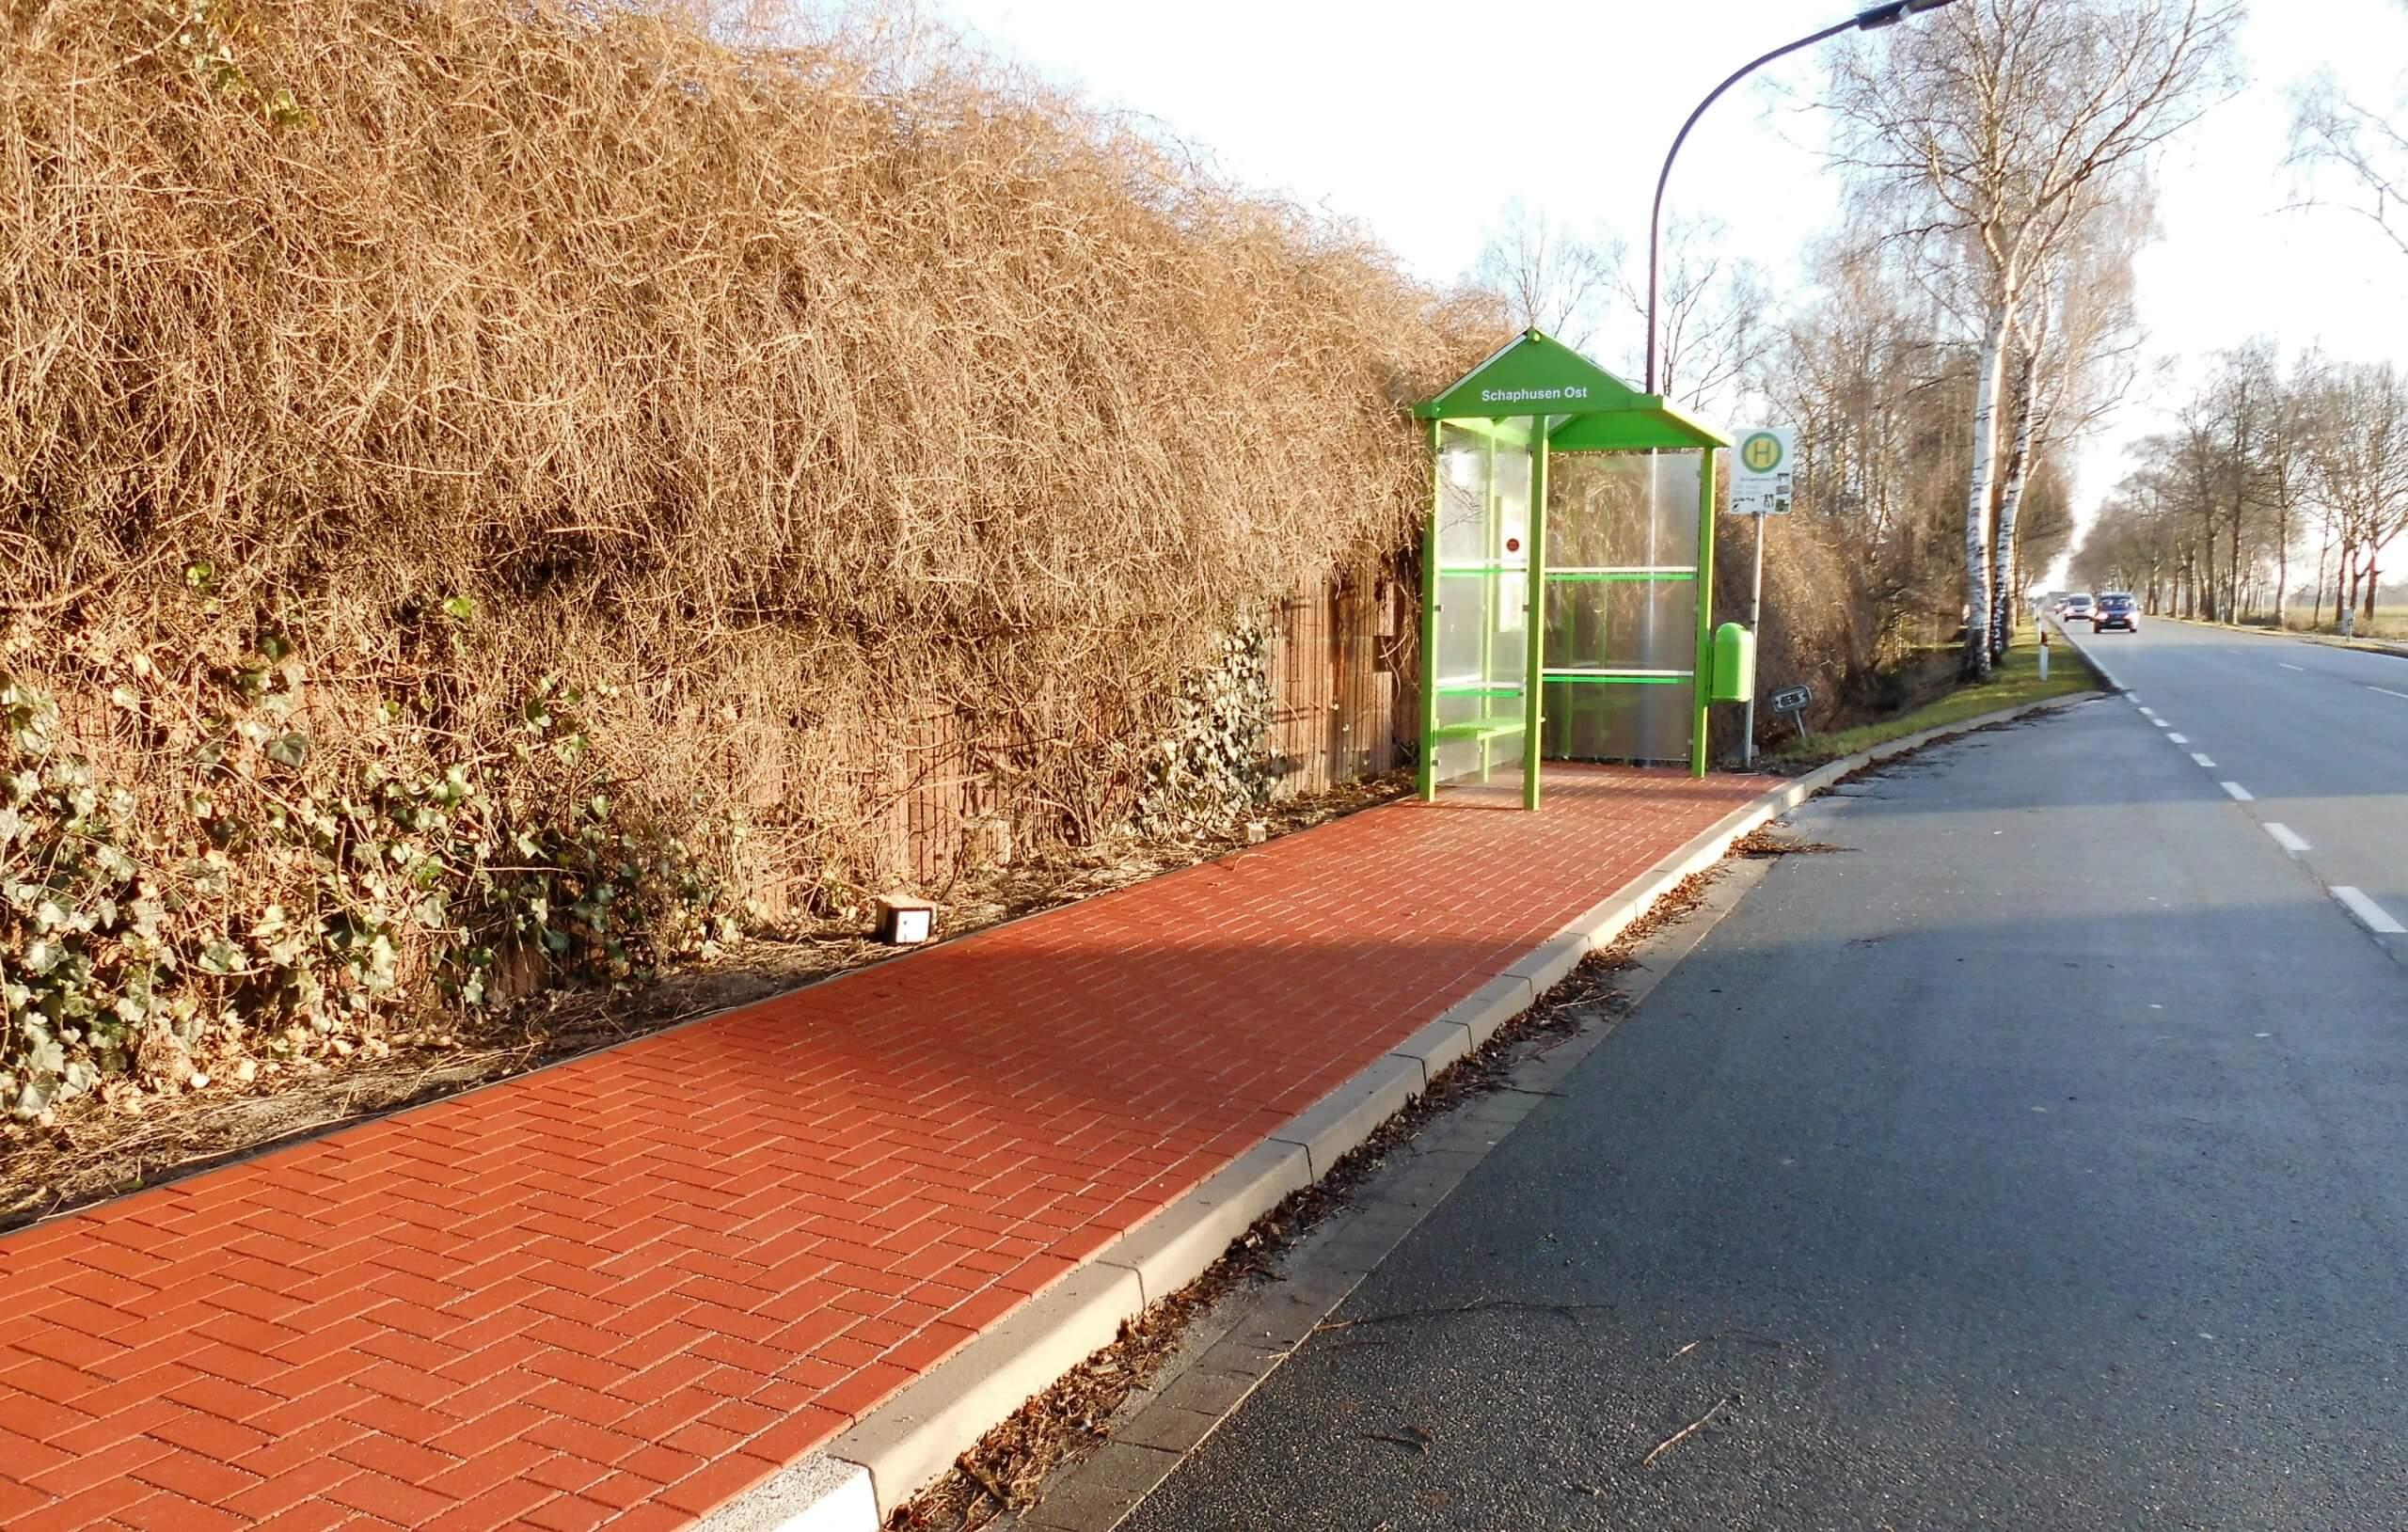 Umgestaltung ÖPVN-Haltestellen, Linie 730/745, in Oyten (Projekt: 5048)